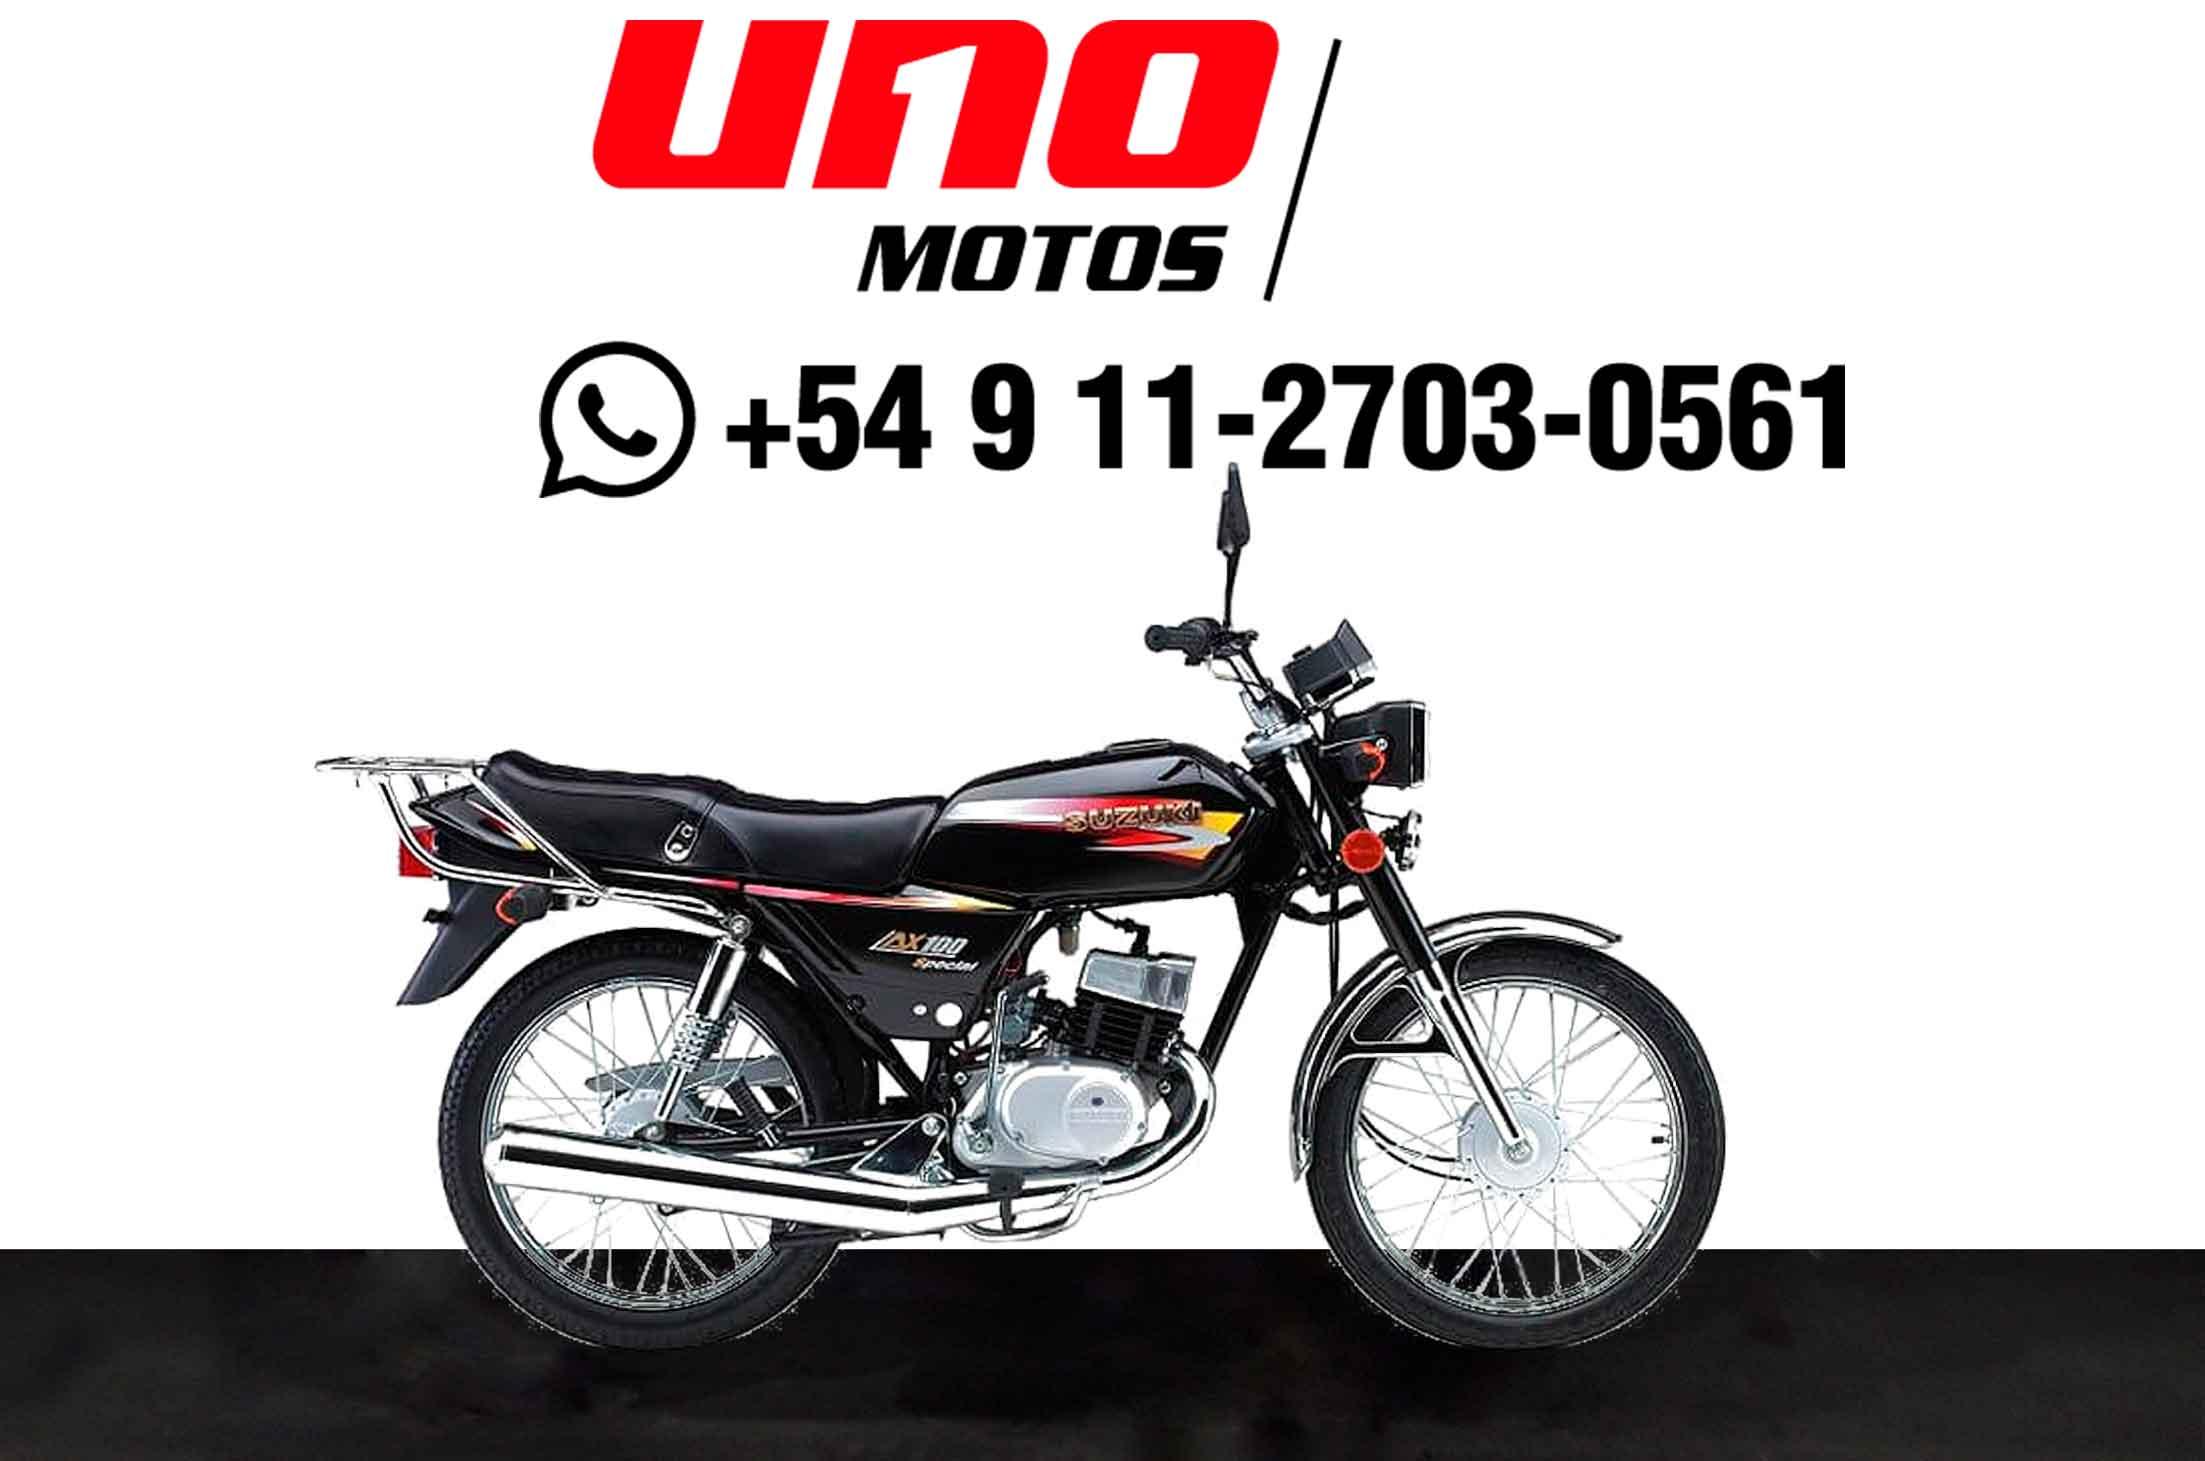 Moto Suzuki AX 100 Negro - Azul